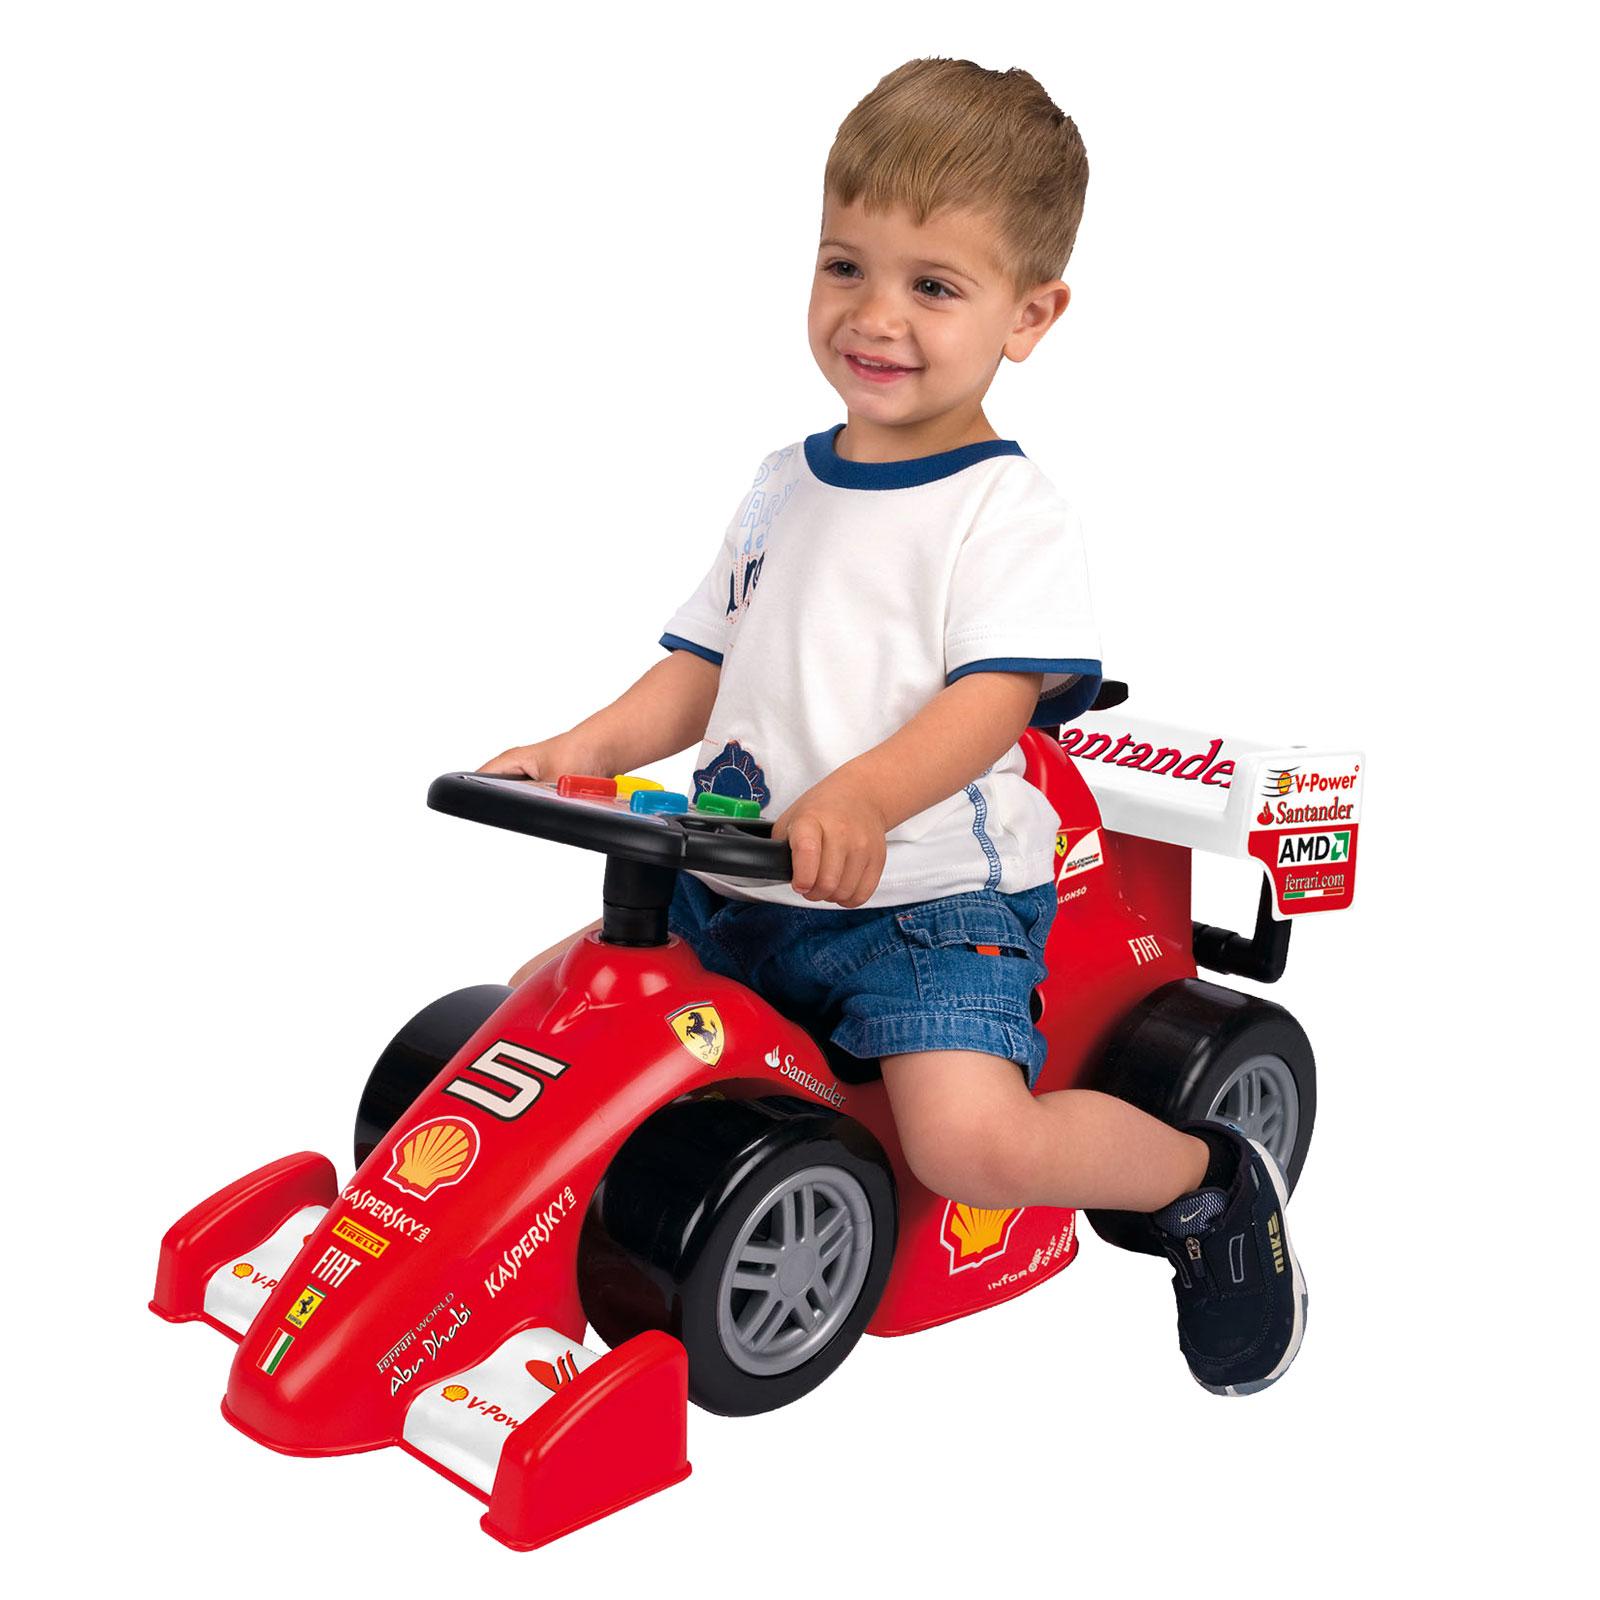 retro roller kinder laufauto rutschauto baby rutscher auto bobby car fahrzeug ebay. Black Bedroom Furniture Sets. Home Design Ideas